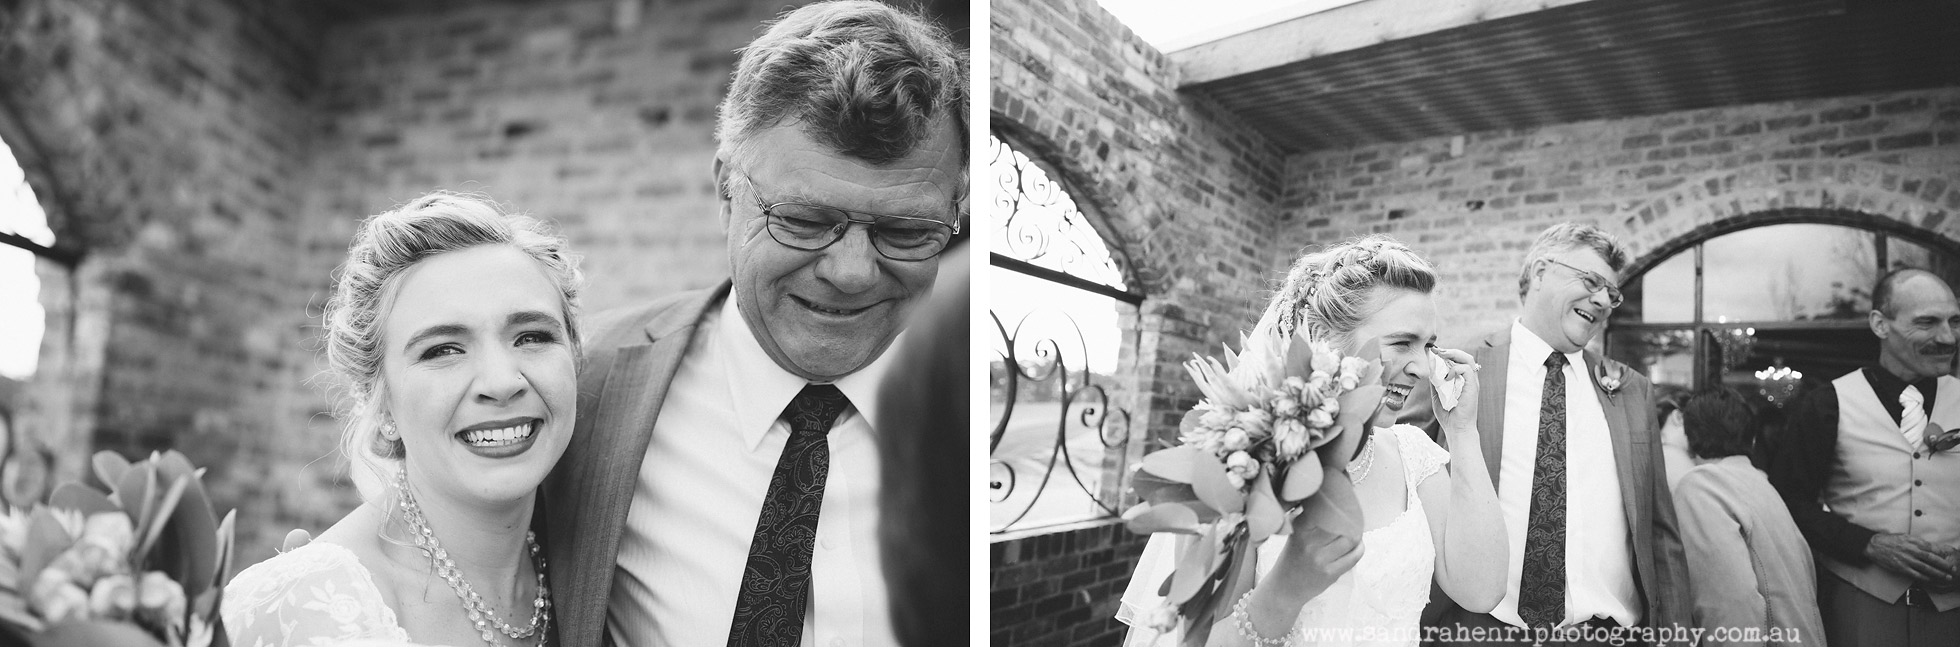 Wedding-photographer-Mali-Brae-Farm-42.jpg